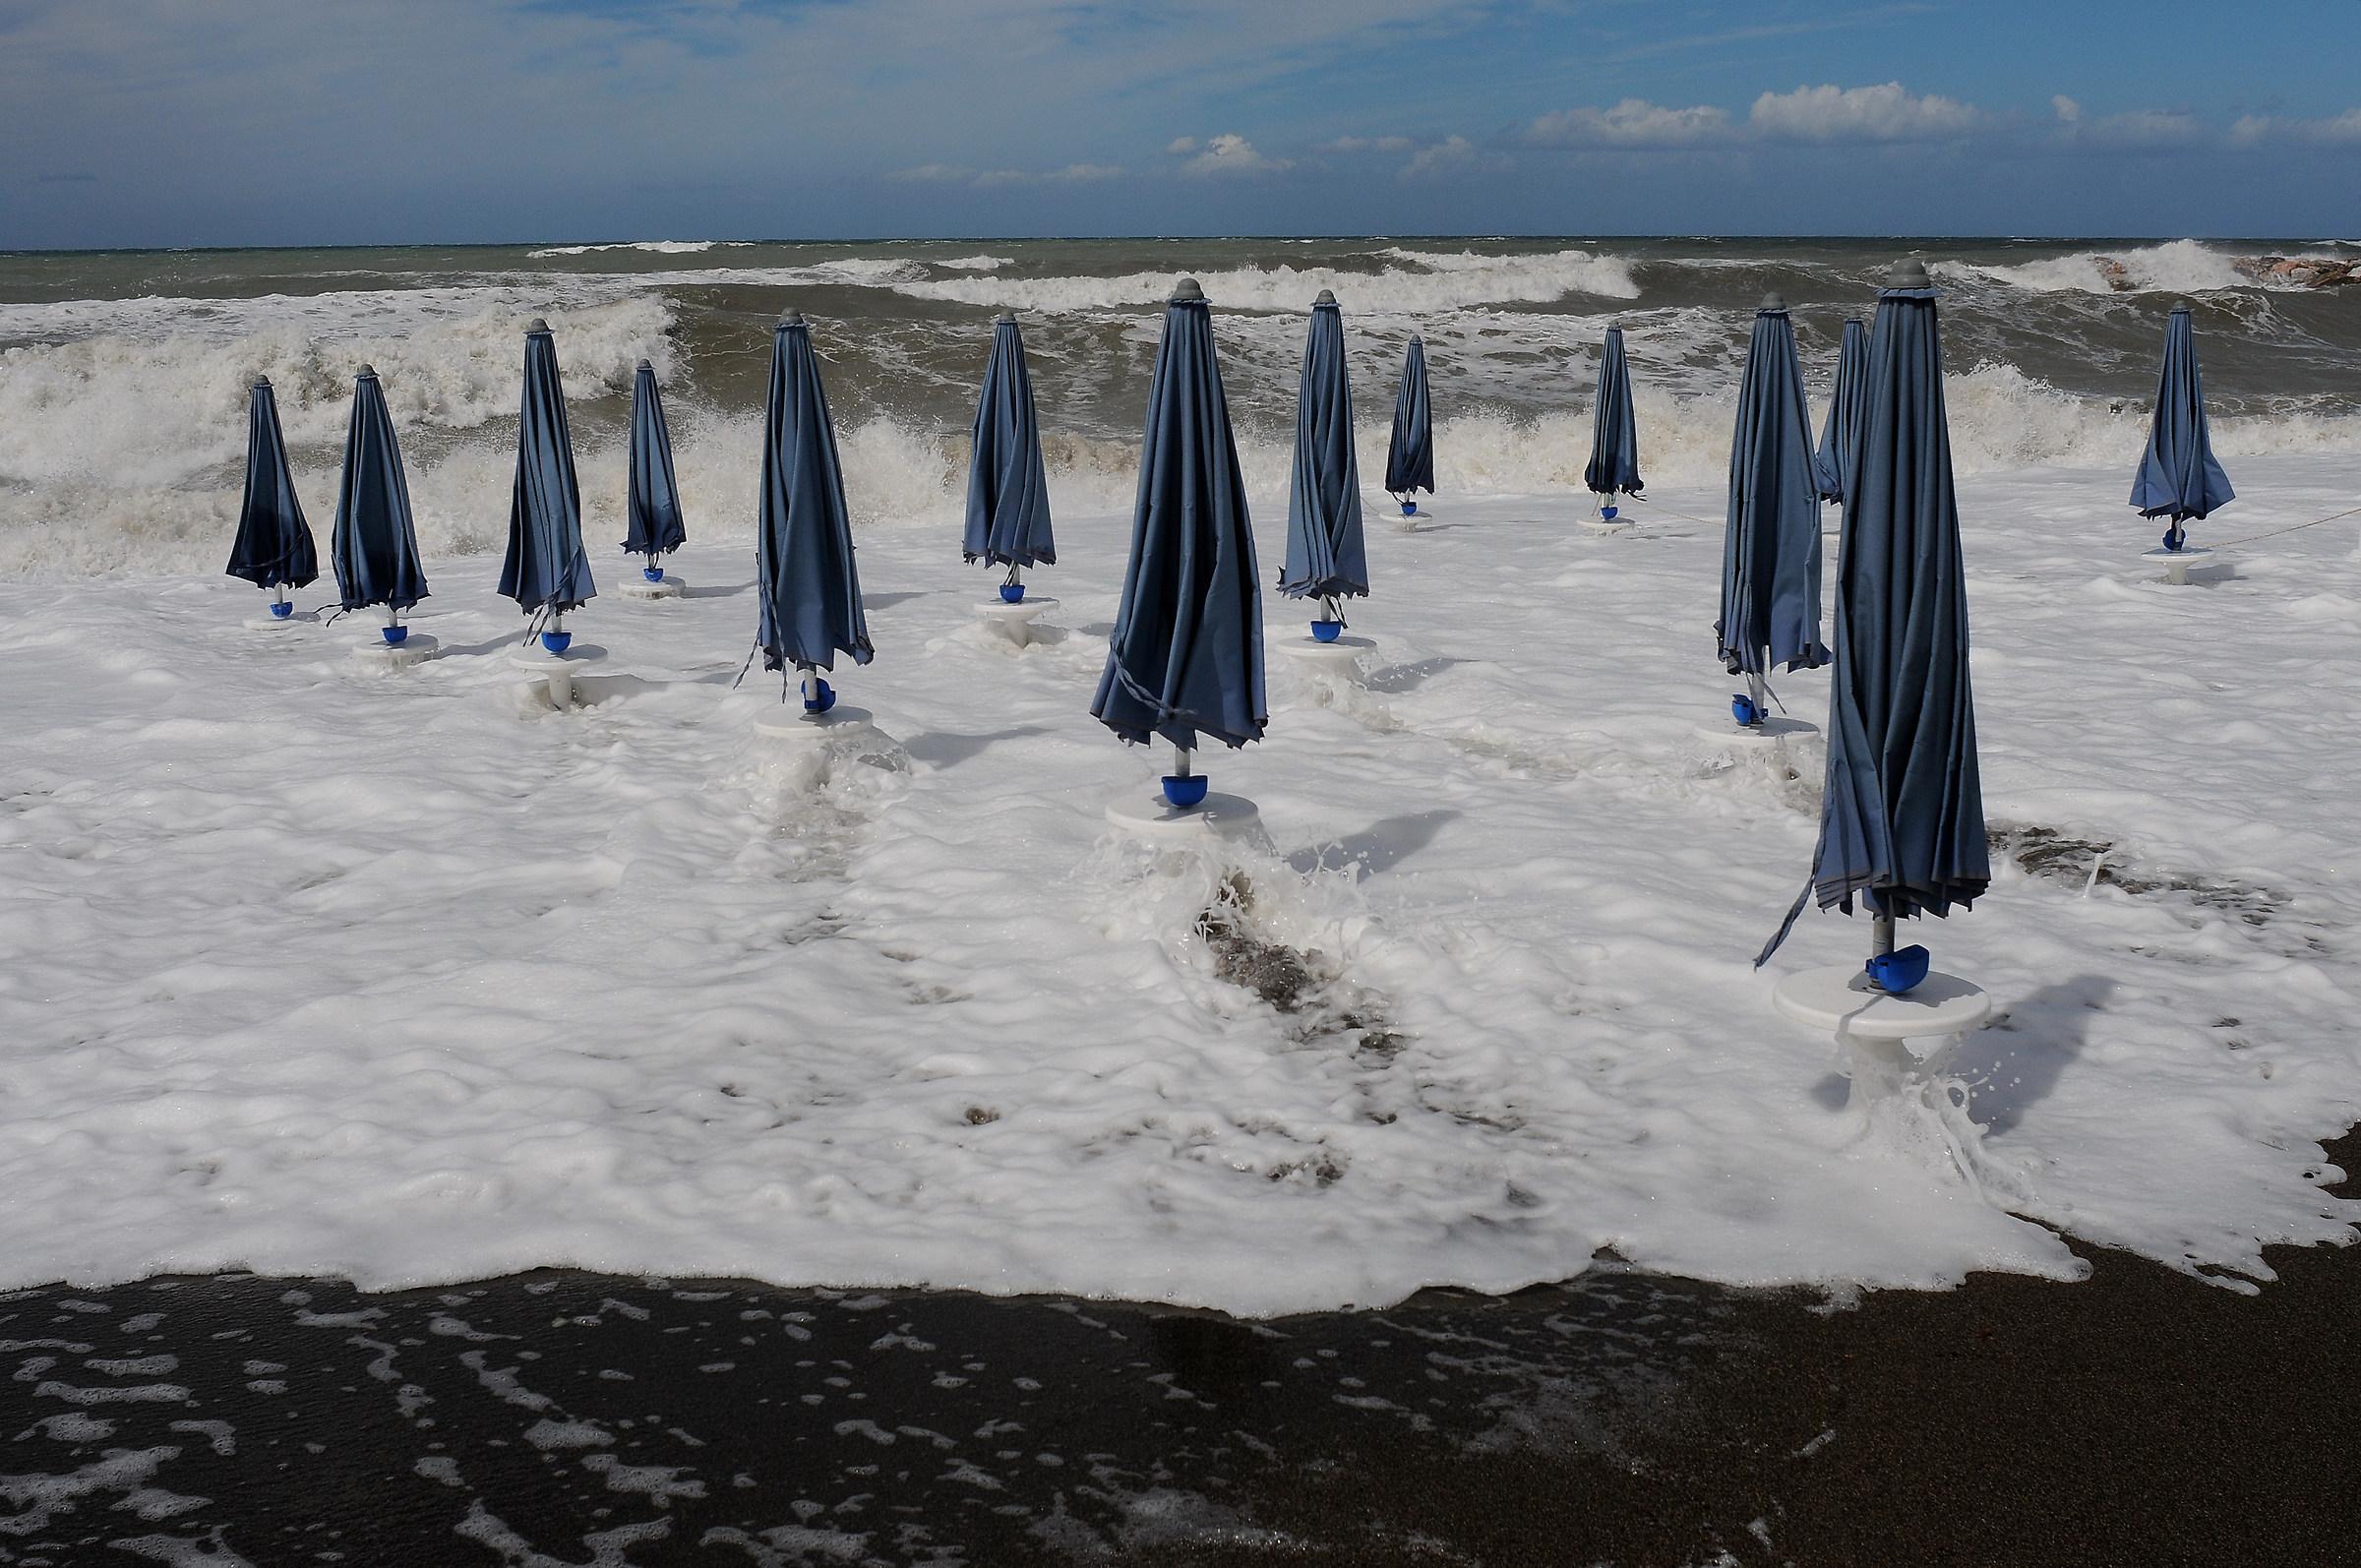 Beach umbrellas near the sea ......